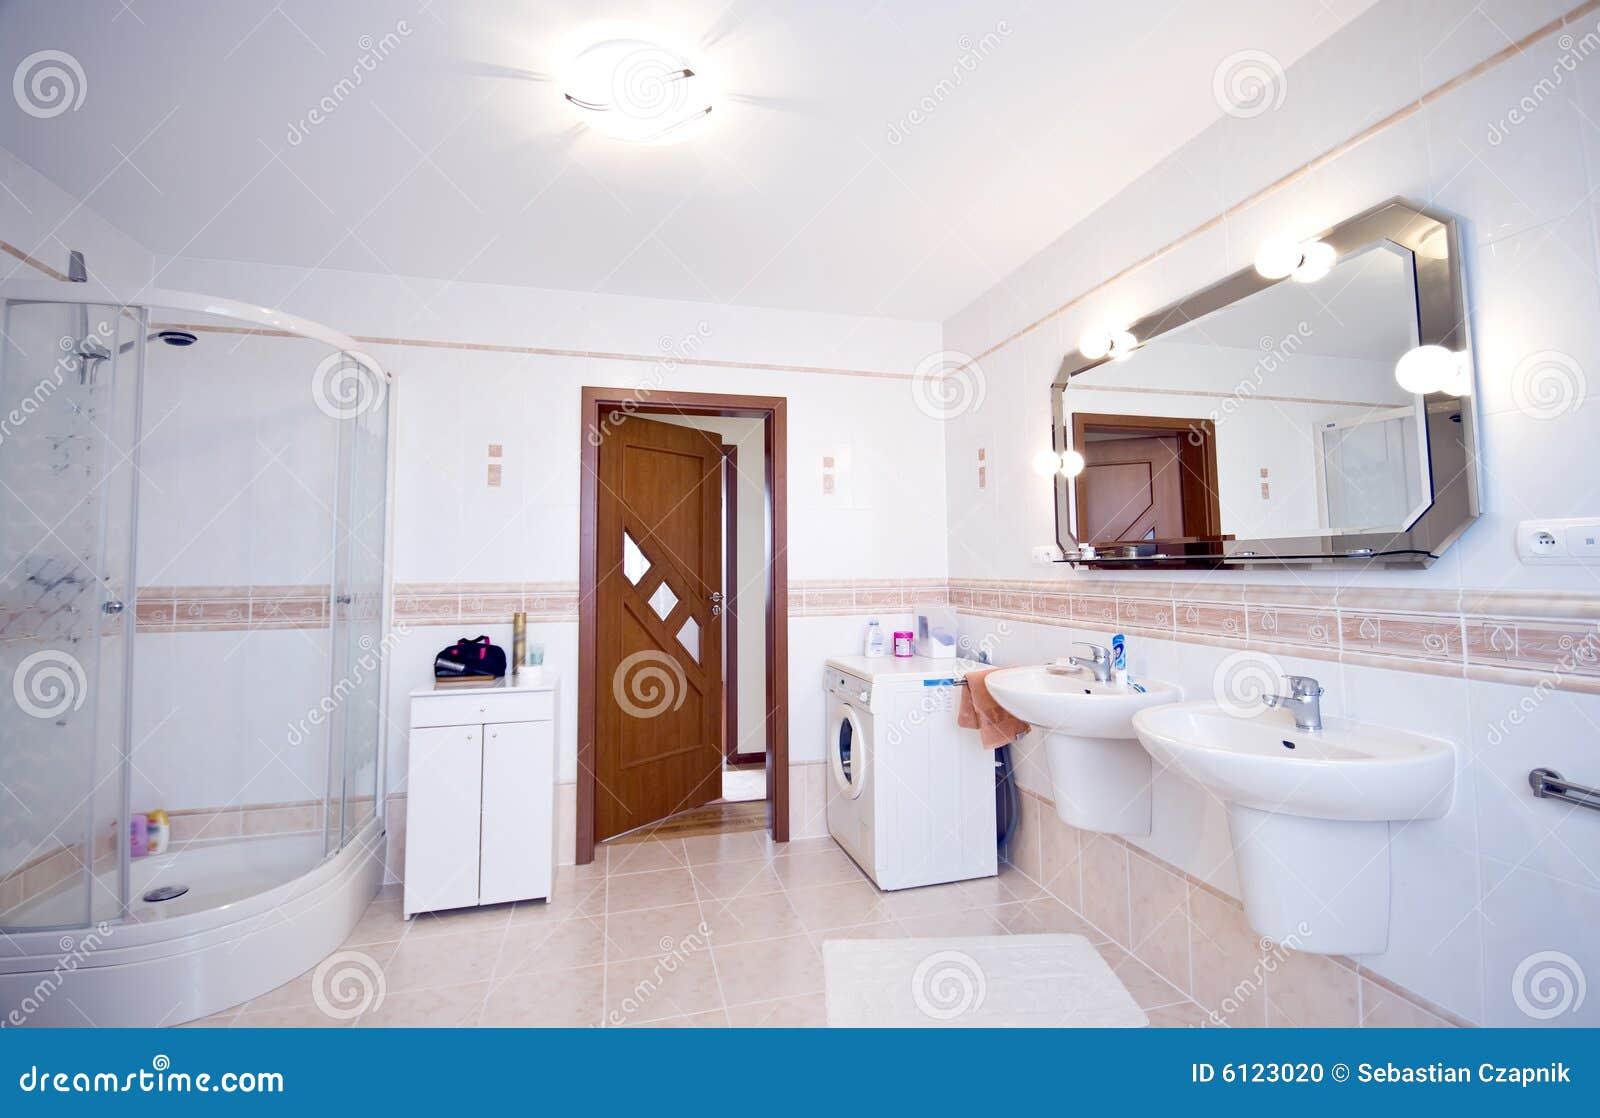 Bathroom interior modern